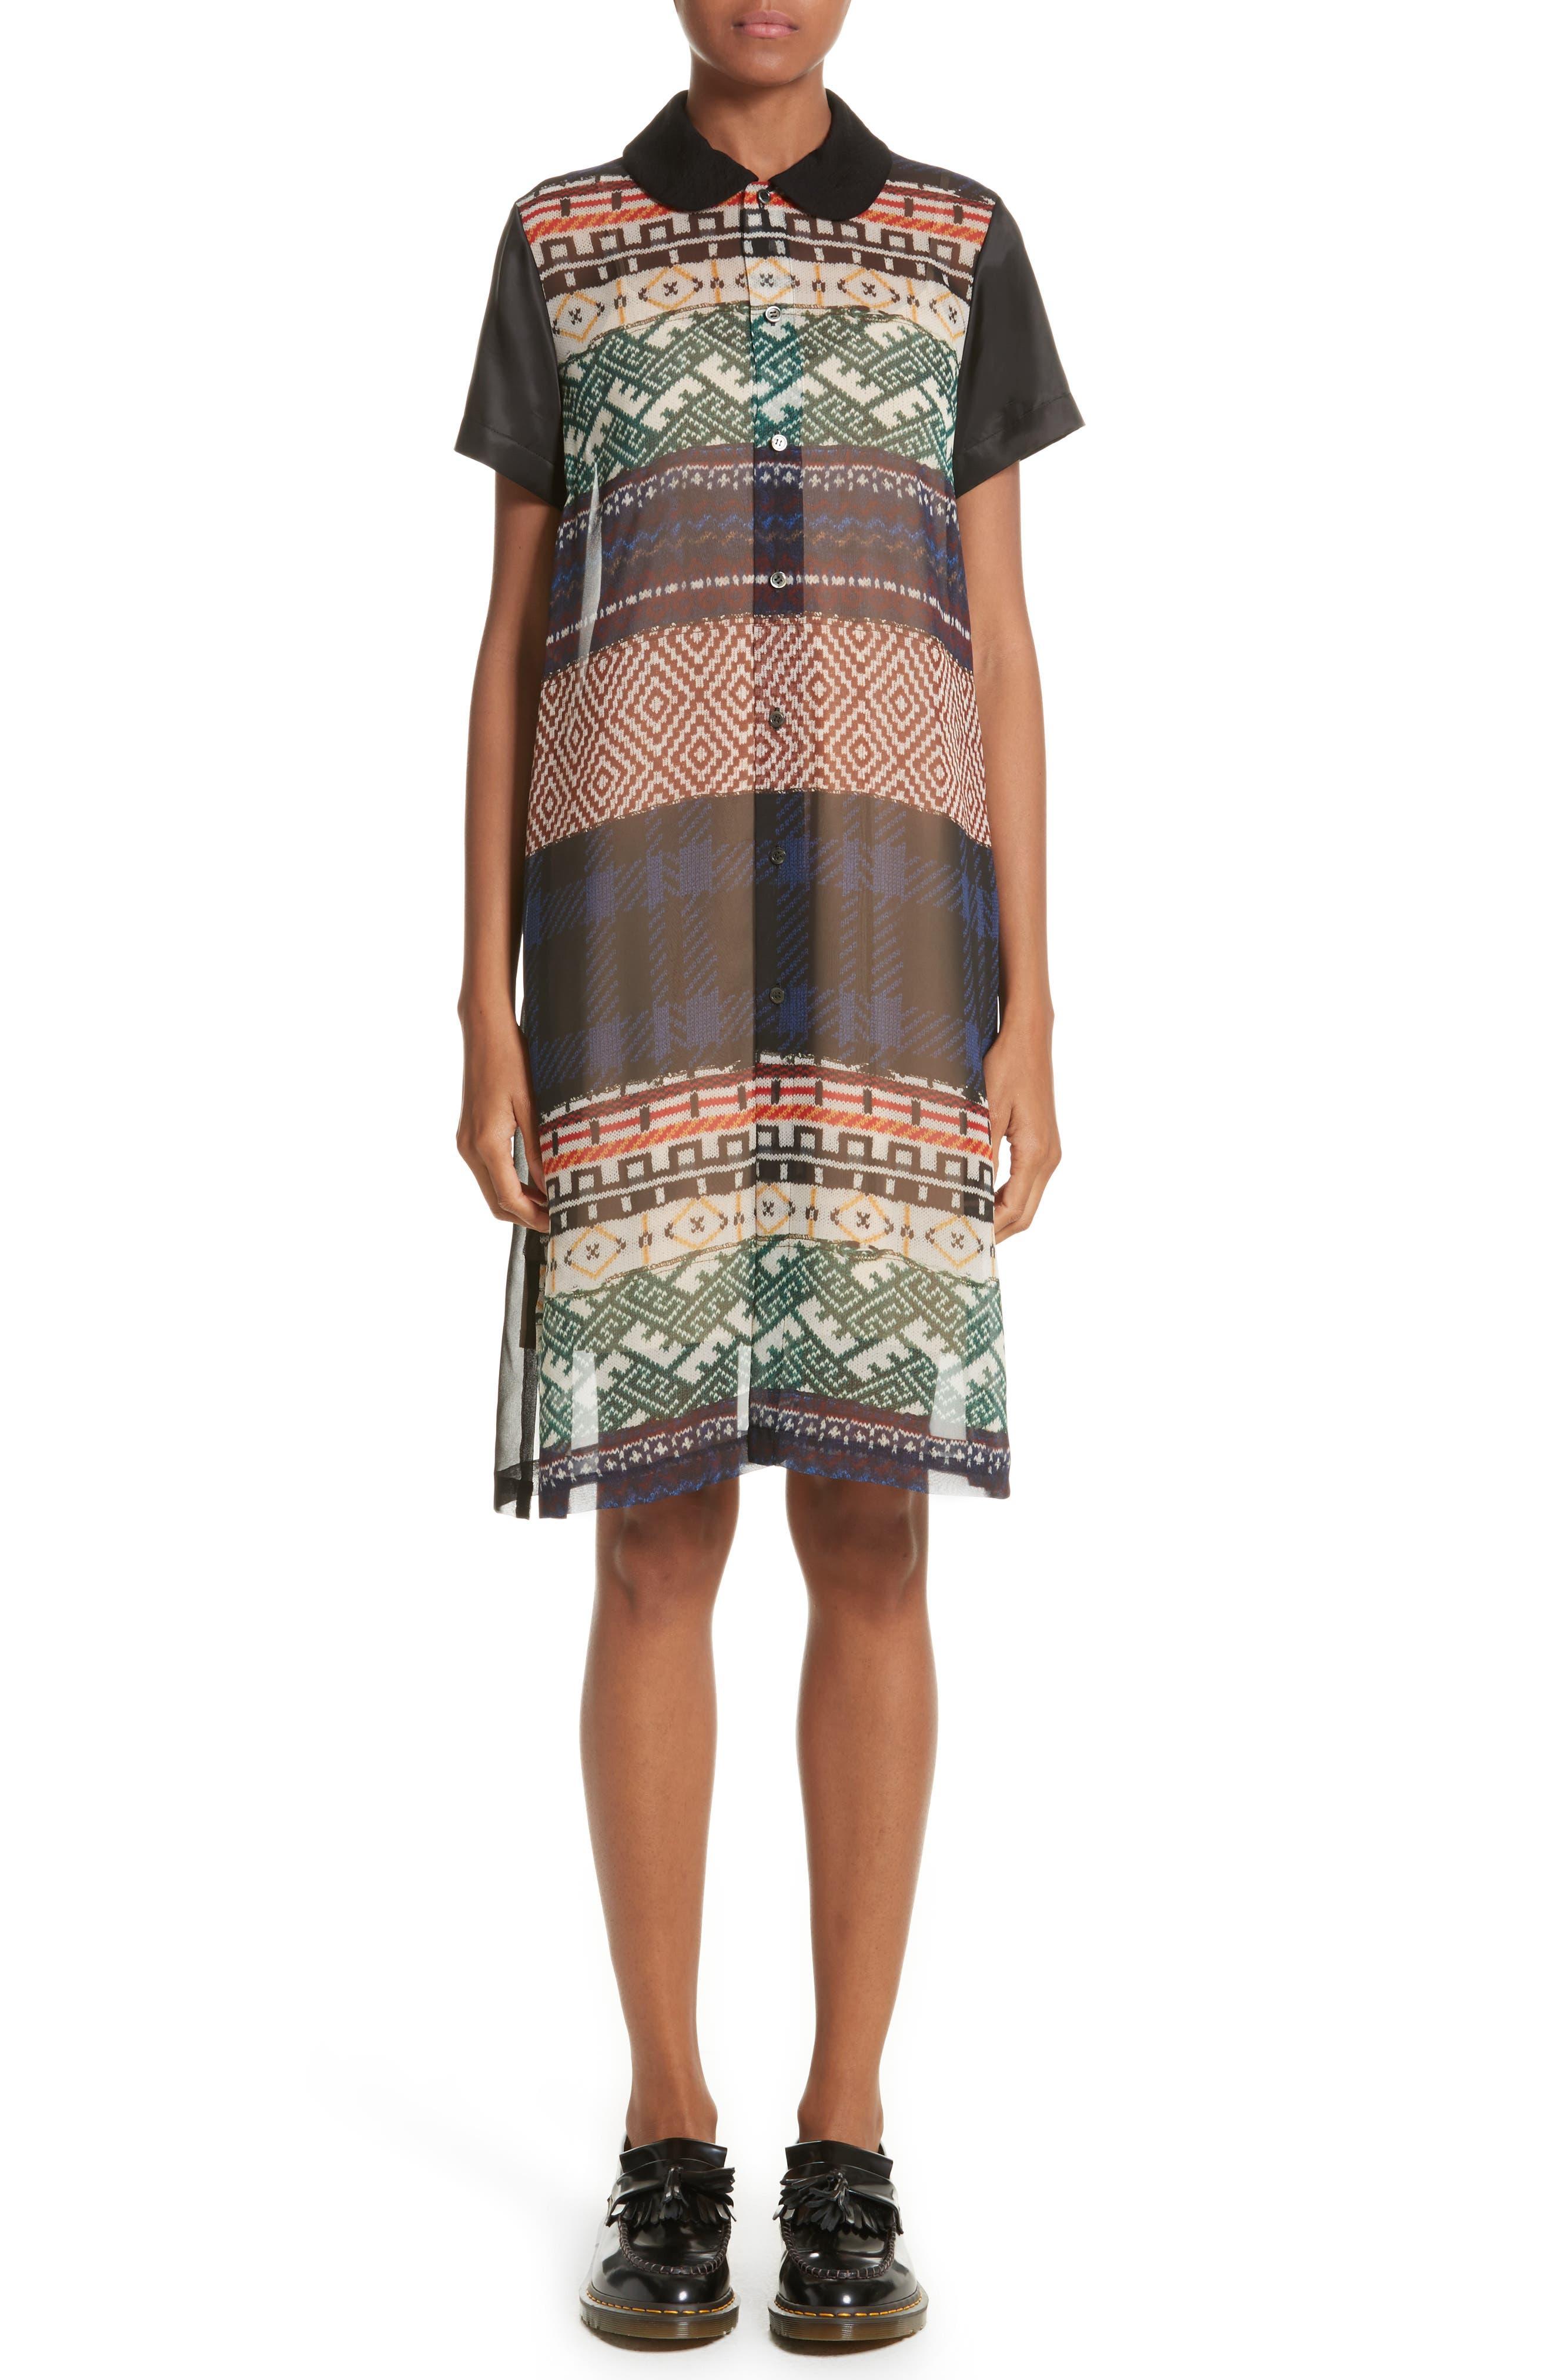 Alternate Image 1 Selected - Tricot Comme des Garçons Mixed Print Short Sleeve Dress